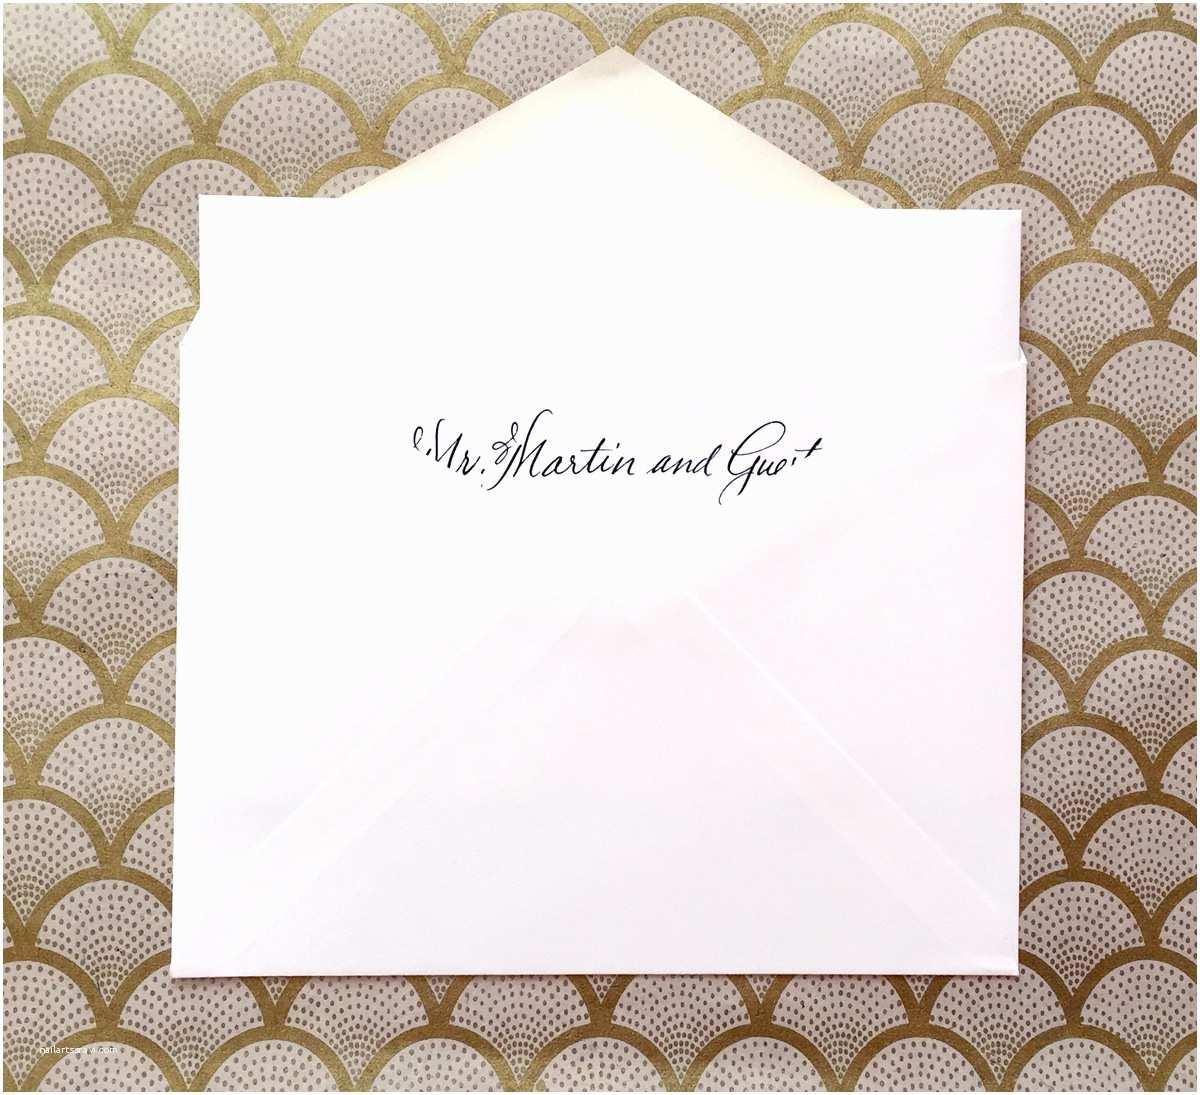 Wedding Invitations Etiquette Addressing Envelopes Nico and Lala Wedding Invitation Etiquette Inner and